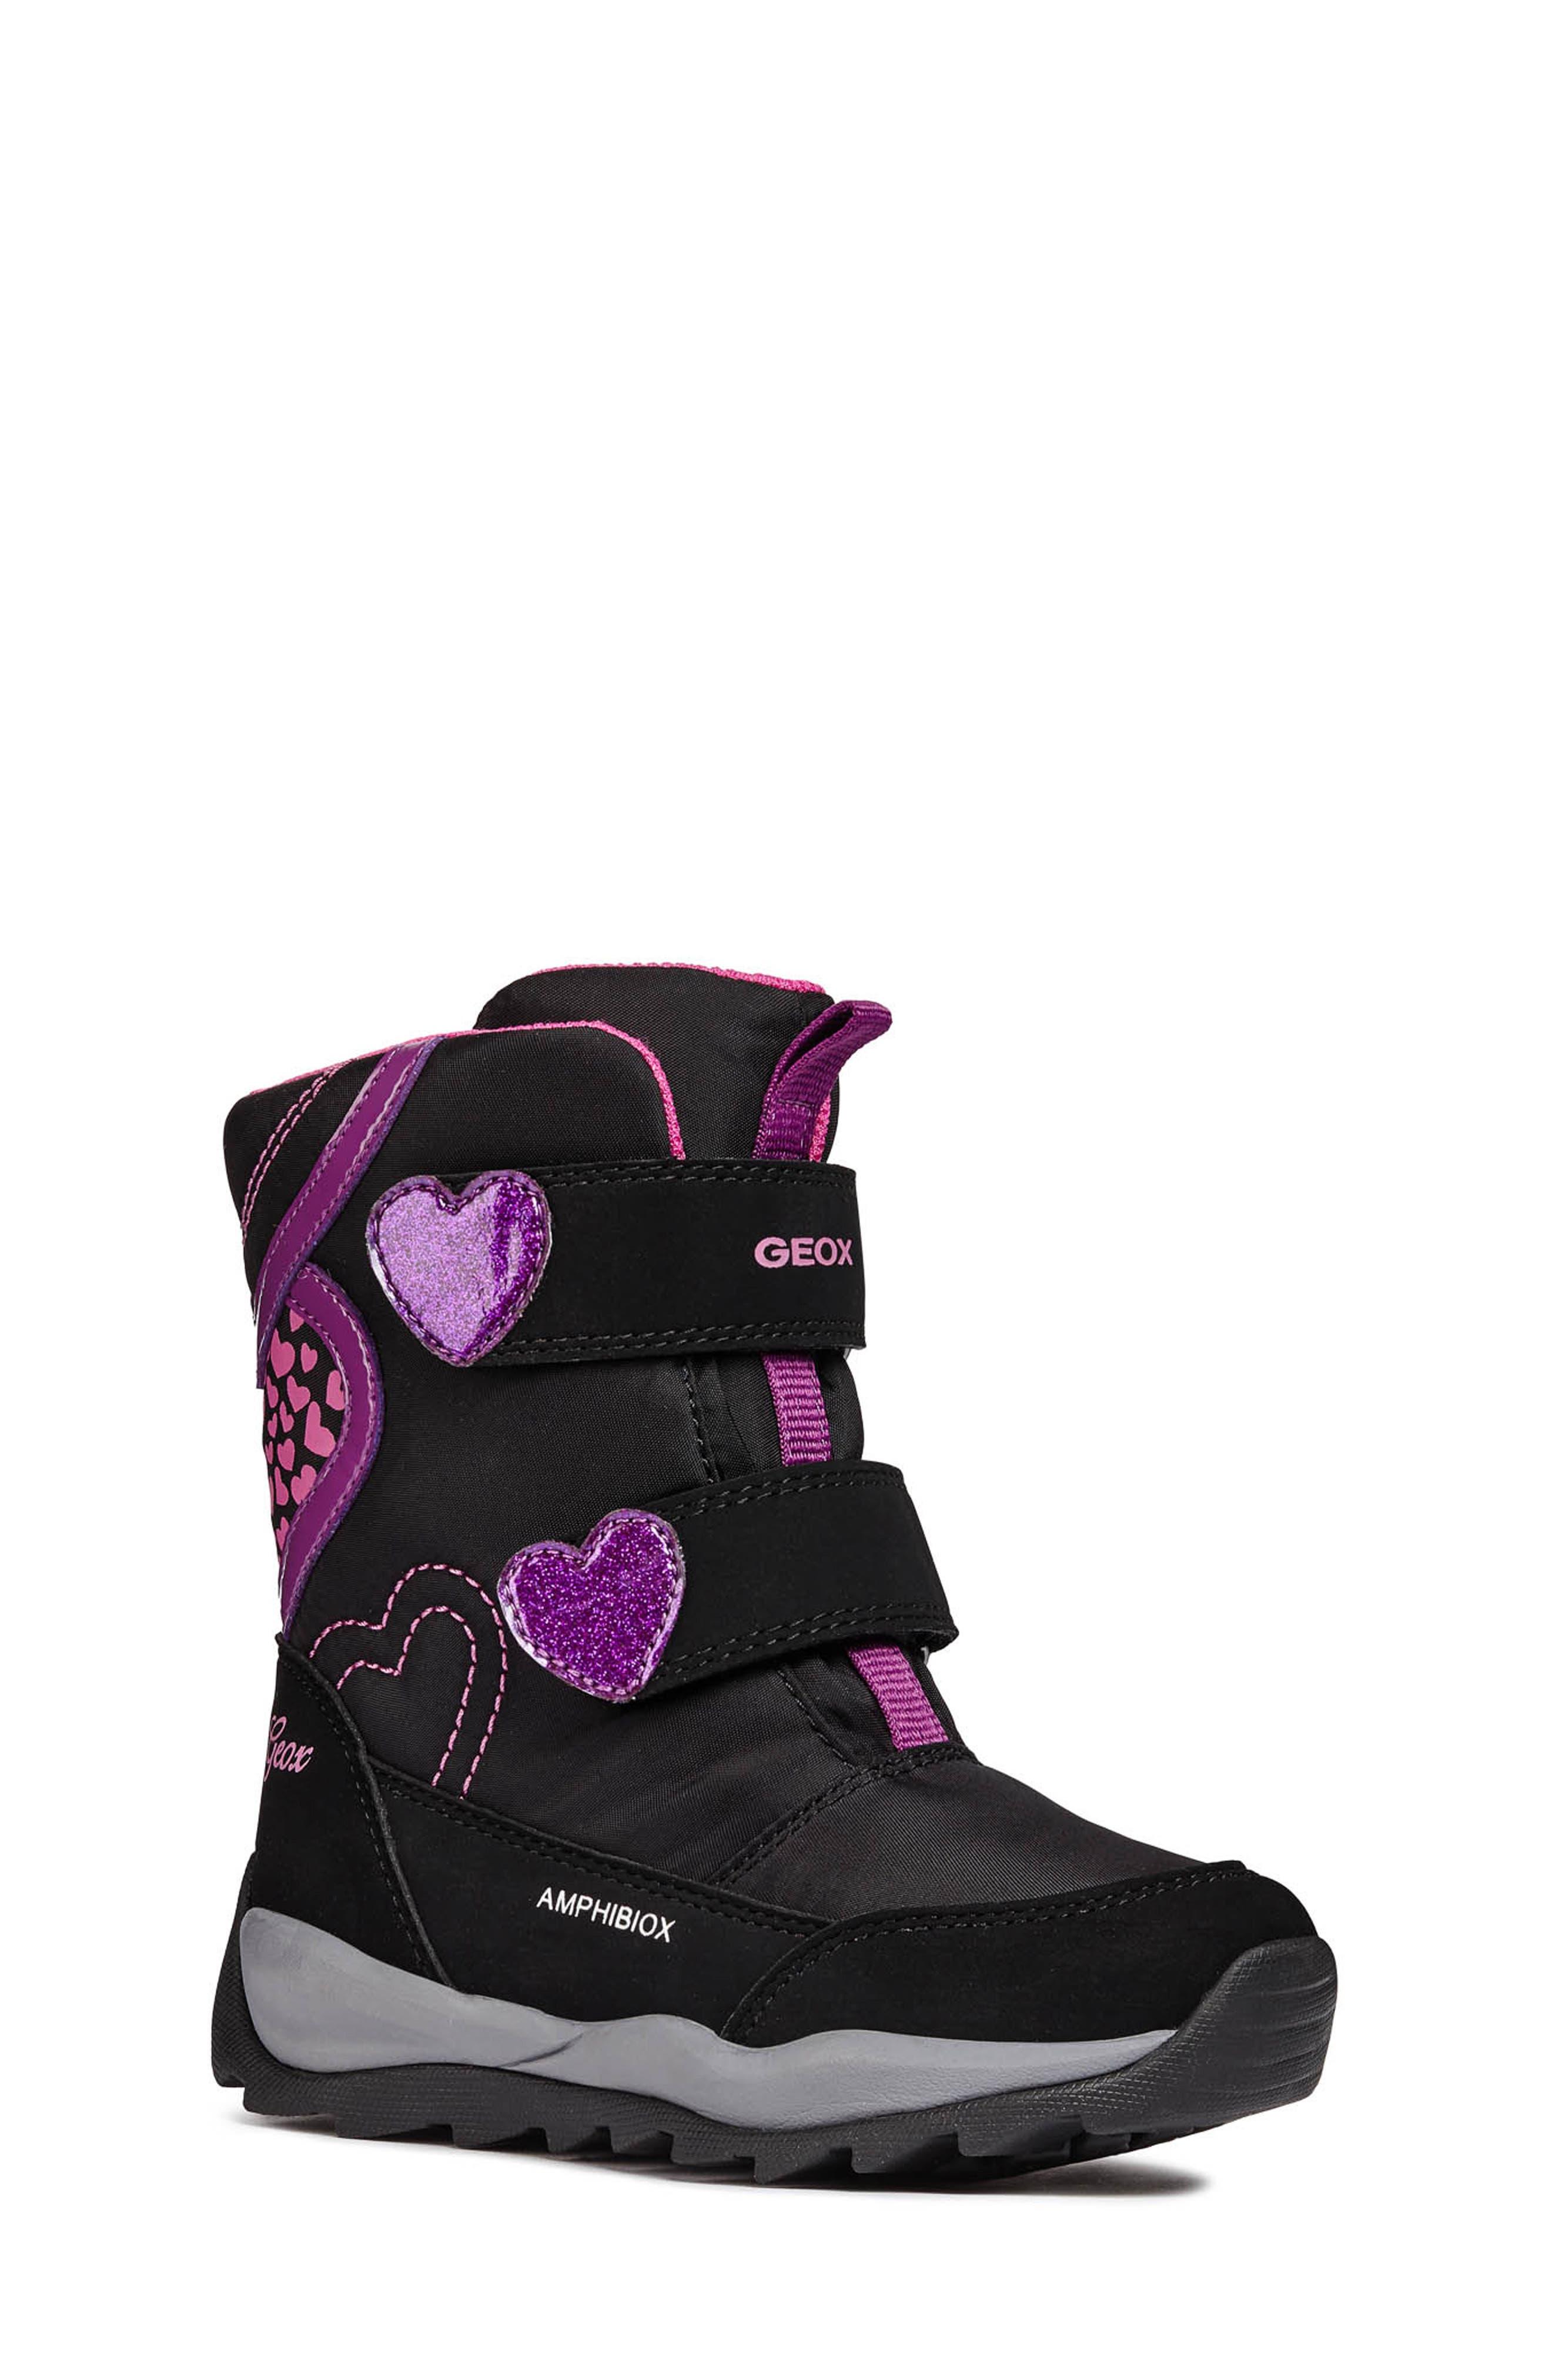 Orizont ABX Waterproof Boot,                         Main,                         color, BLACK/FUCHSIA